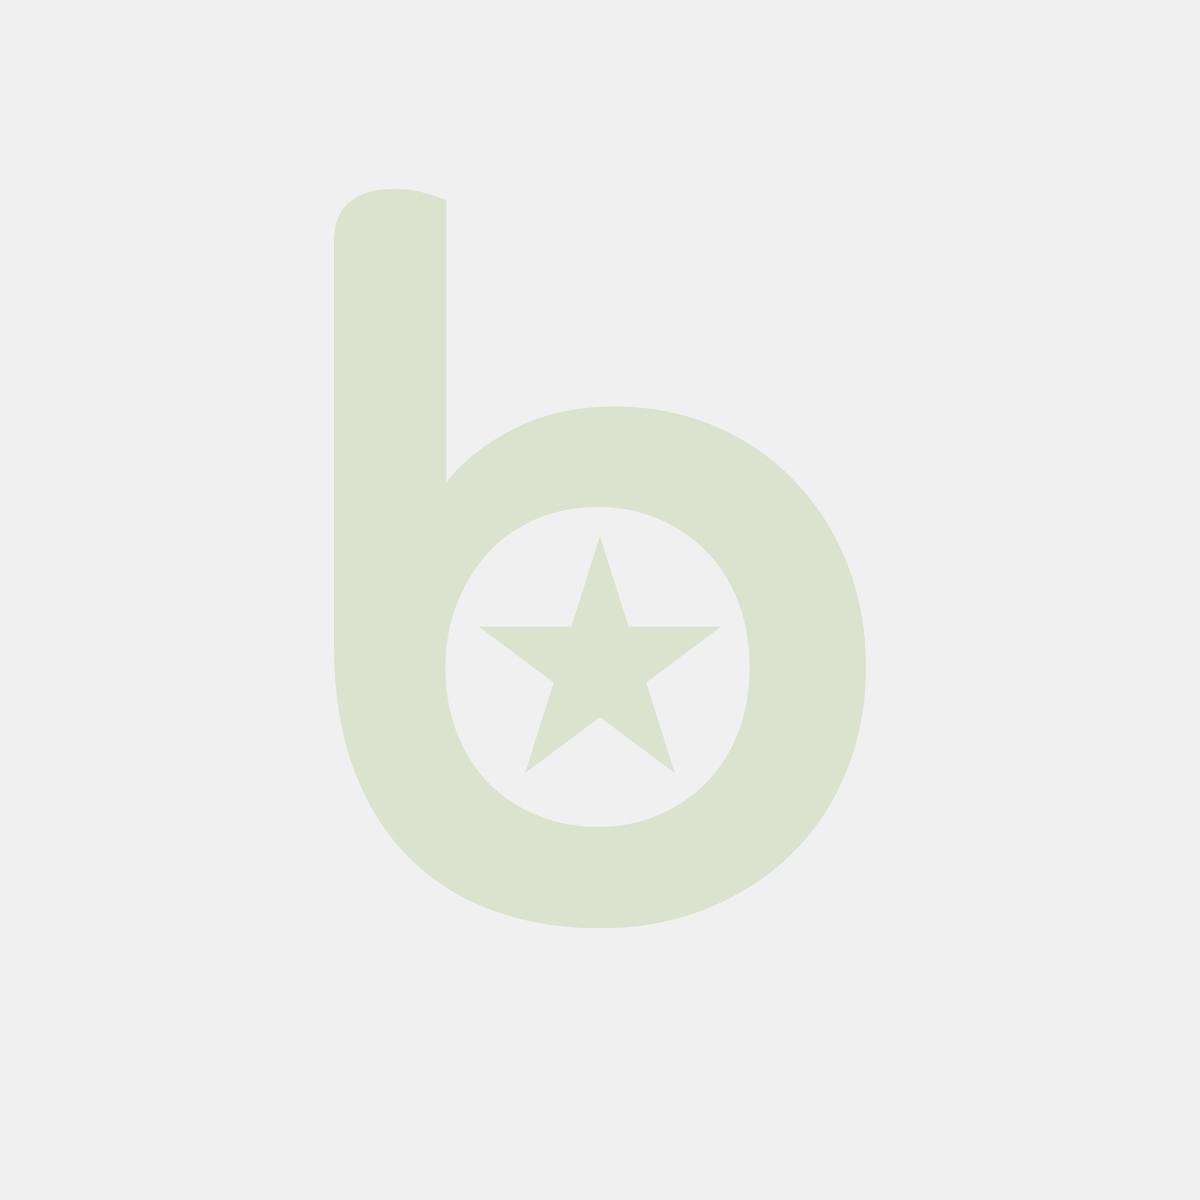 Mini łyżeczka bambusowa TUNG 90mm, op.50szt. - FINGERFOOD